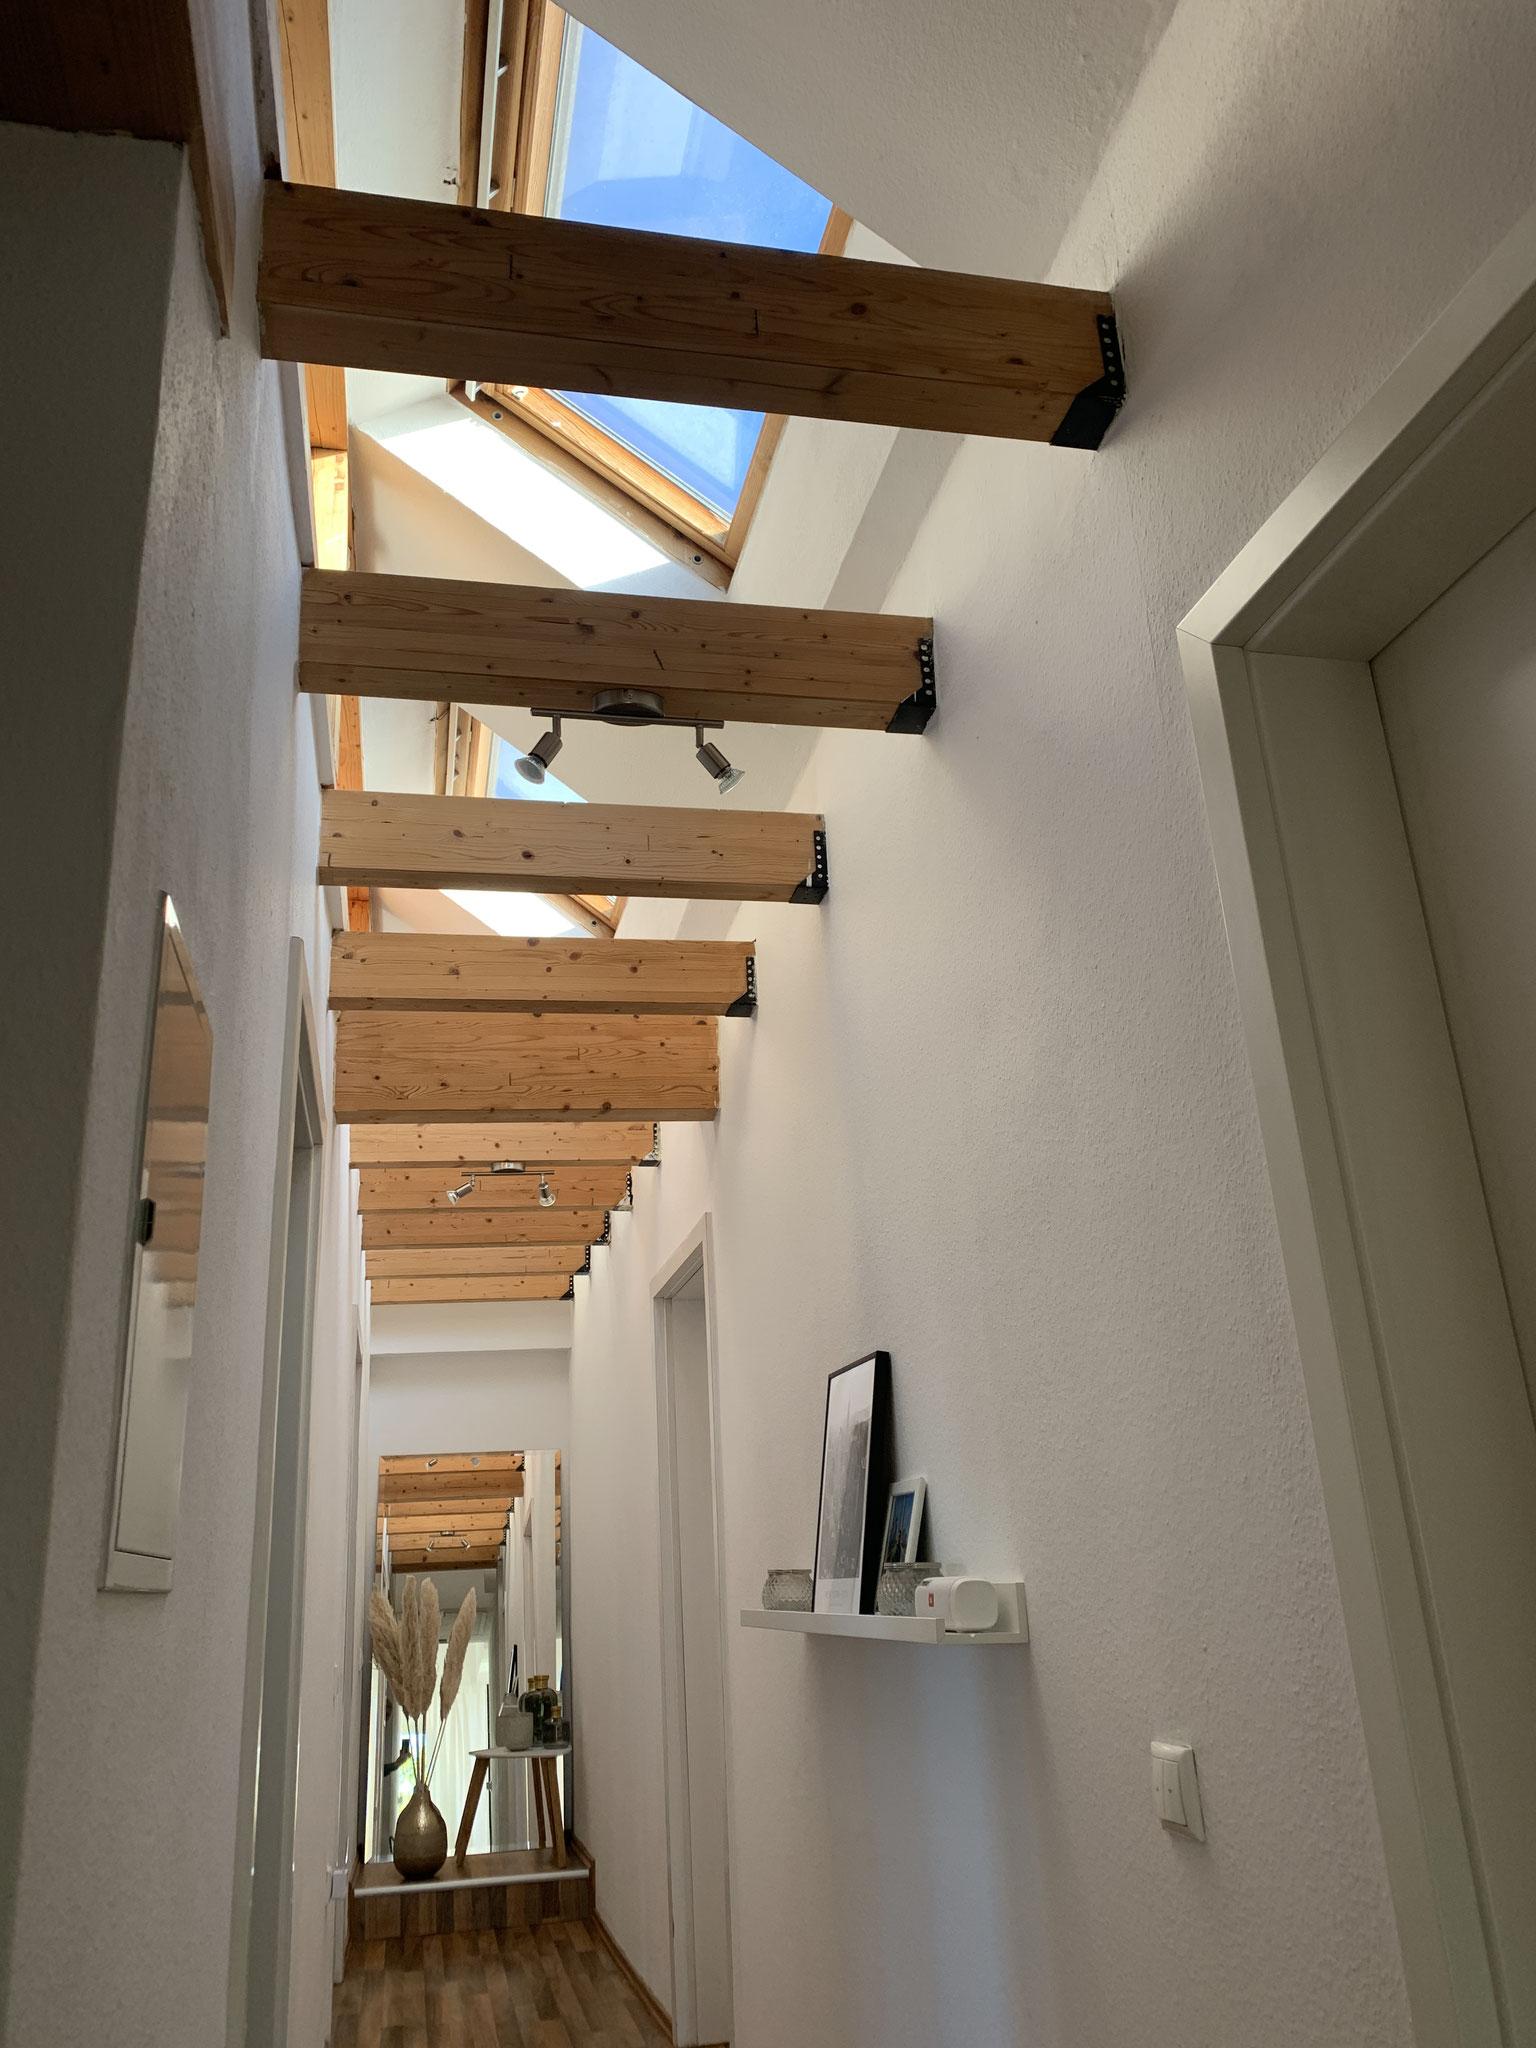 Innenausbau aus Holz